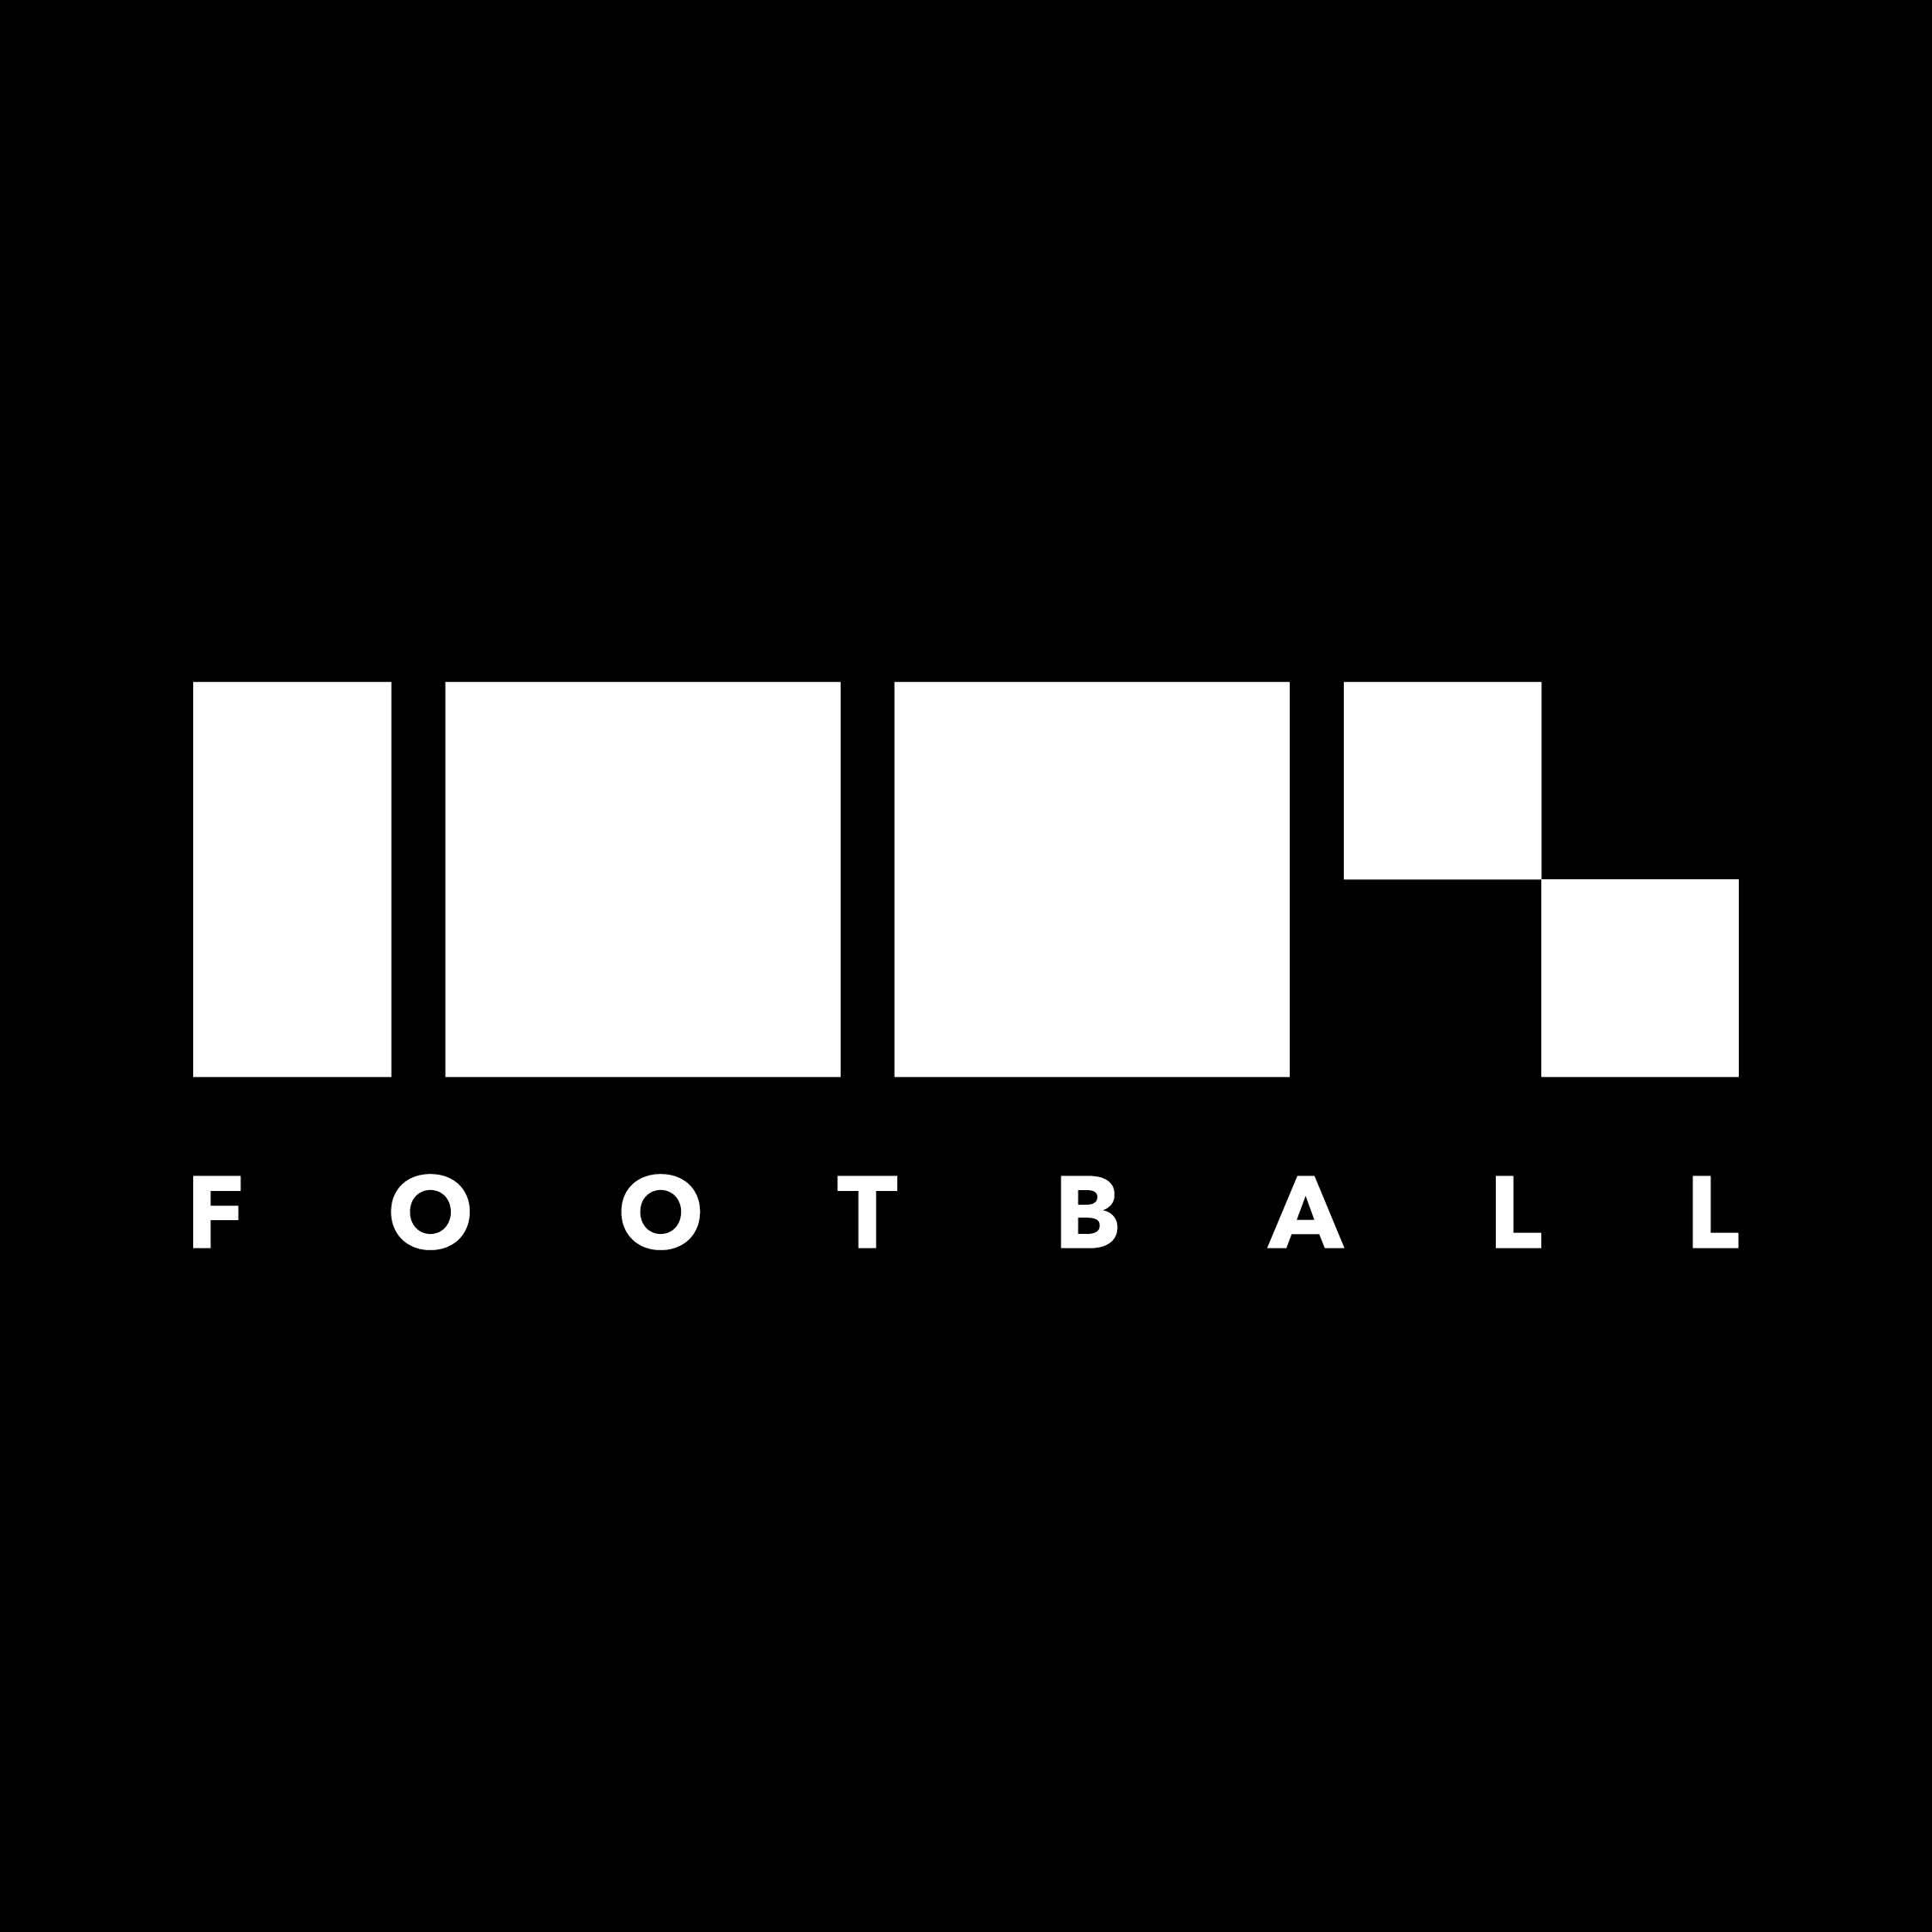 100% Football Eindhoven